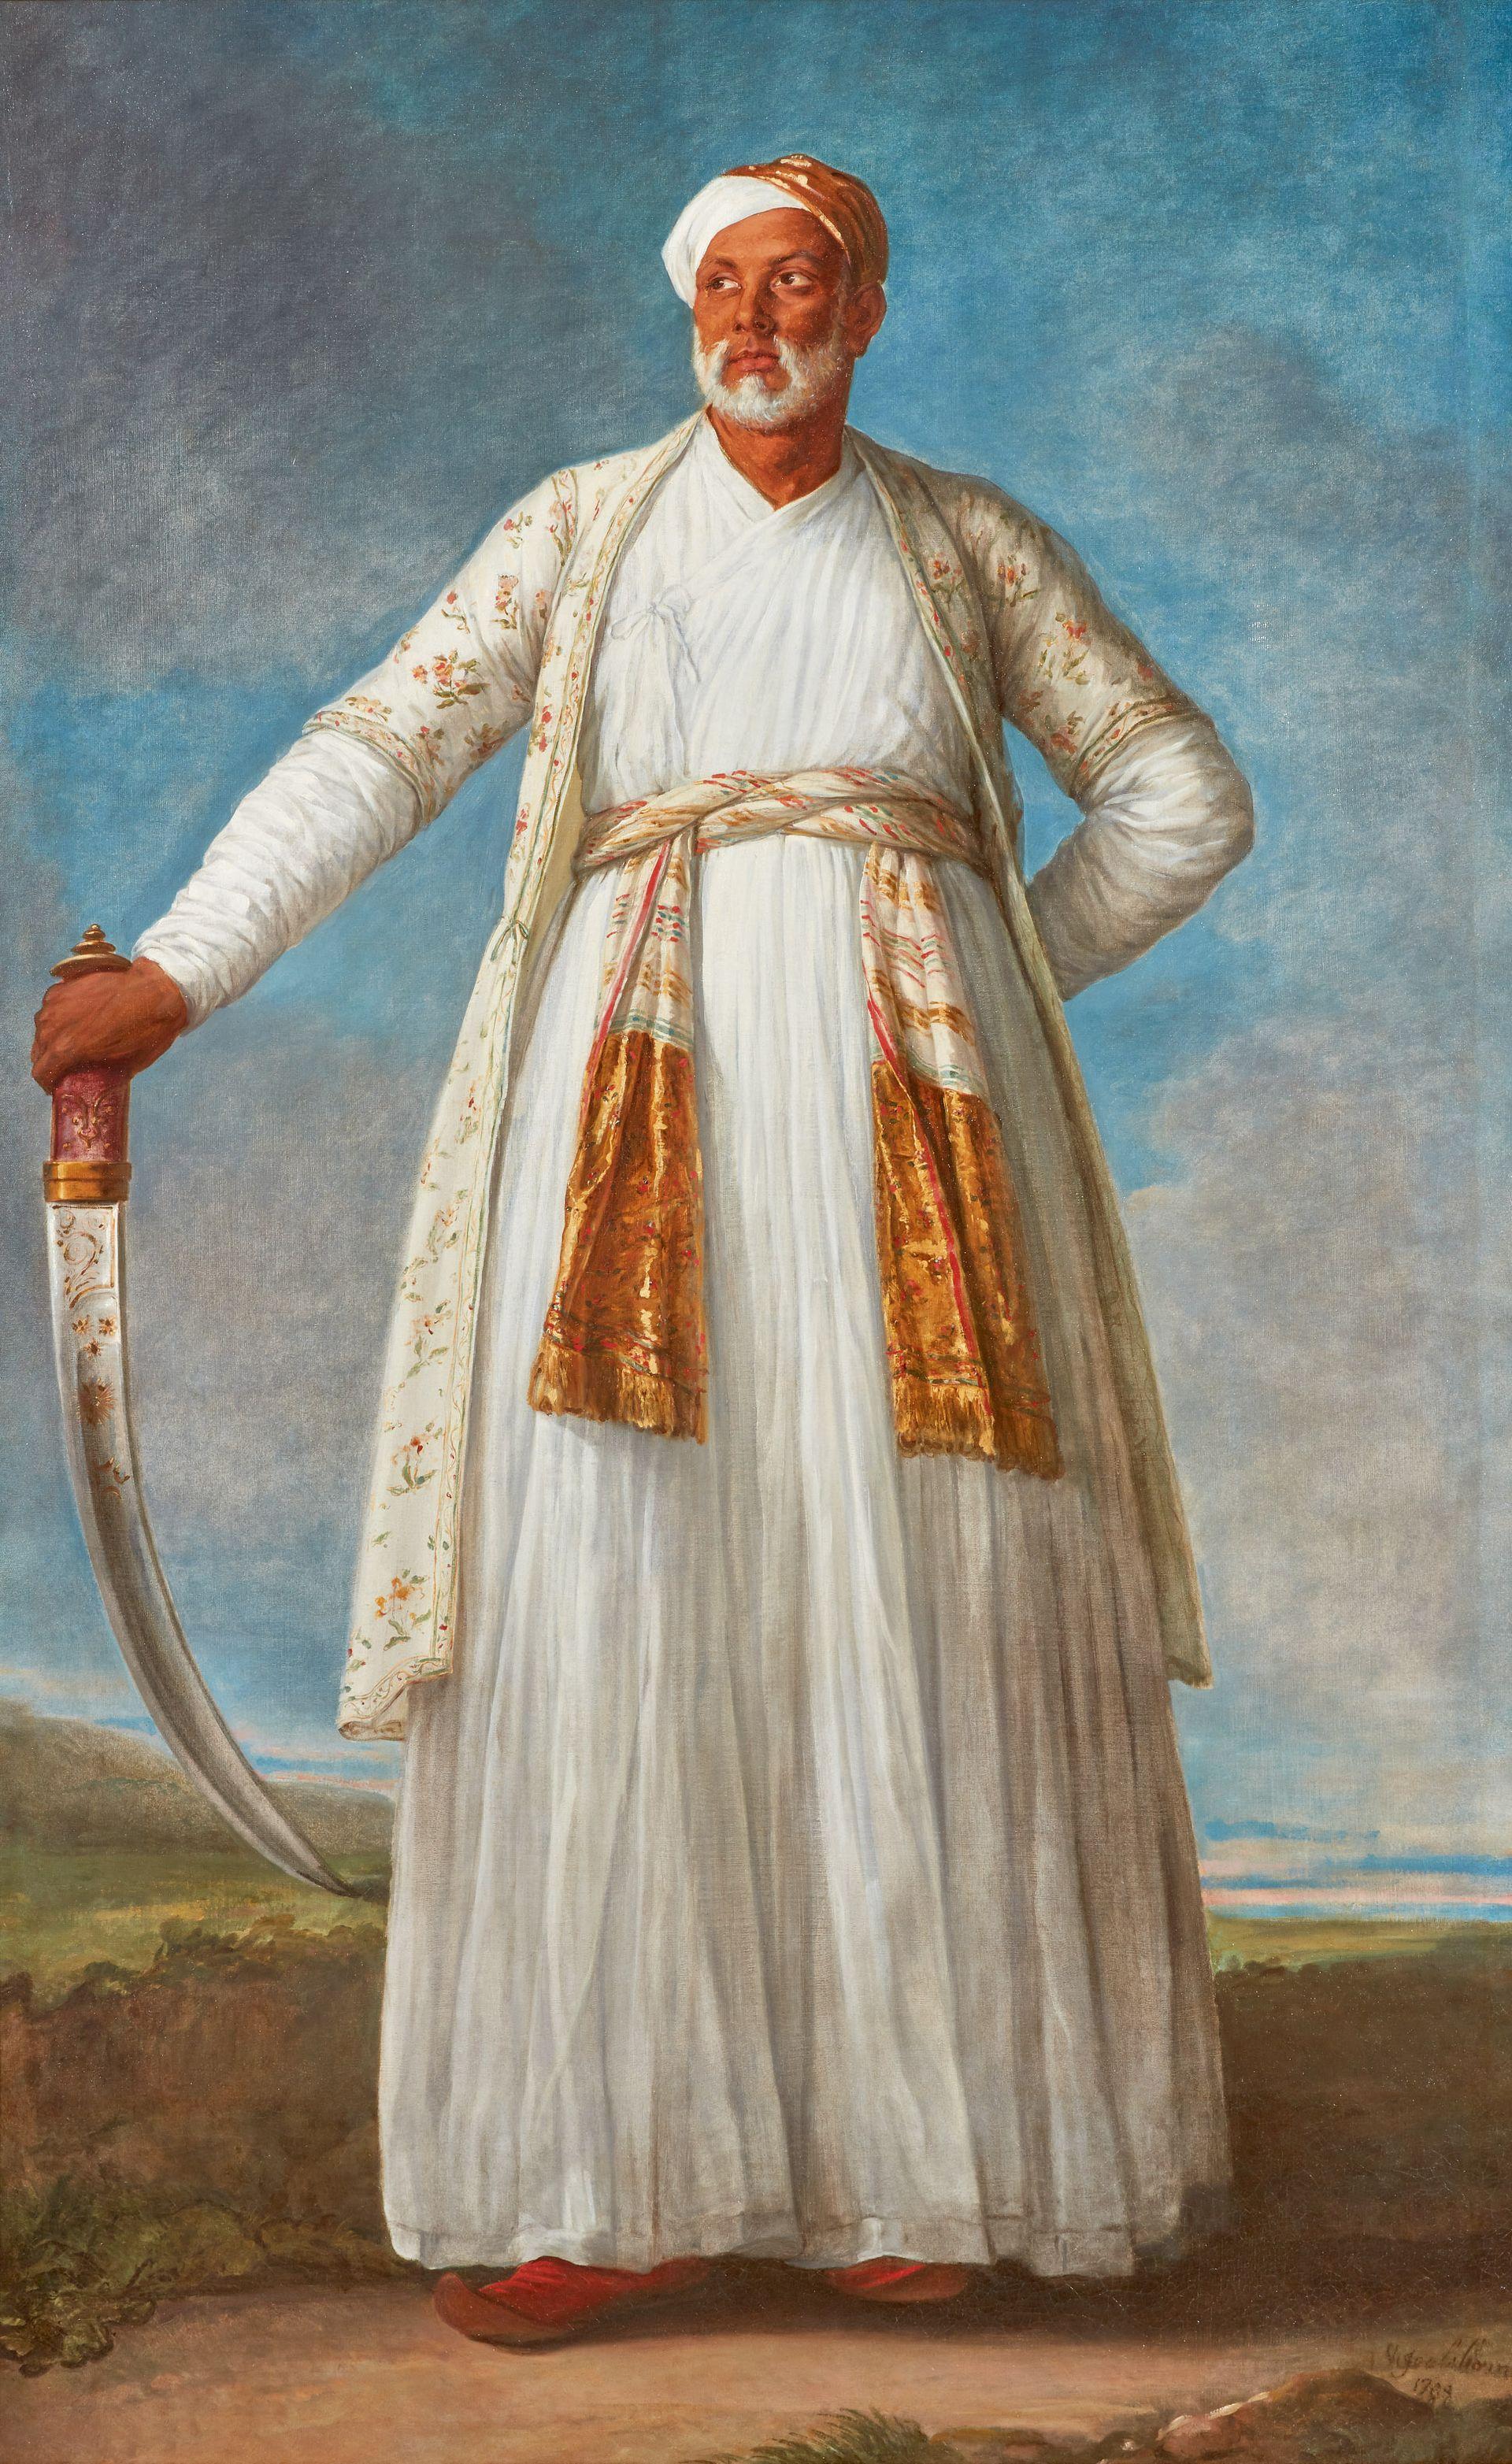 Elisabeth-Louise Vigée Le Brun, Portrait Of Muhammad Dervish Khan, Full-Length, Holding His Sword In A Landscape (1788). Sotheby's